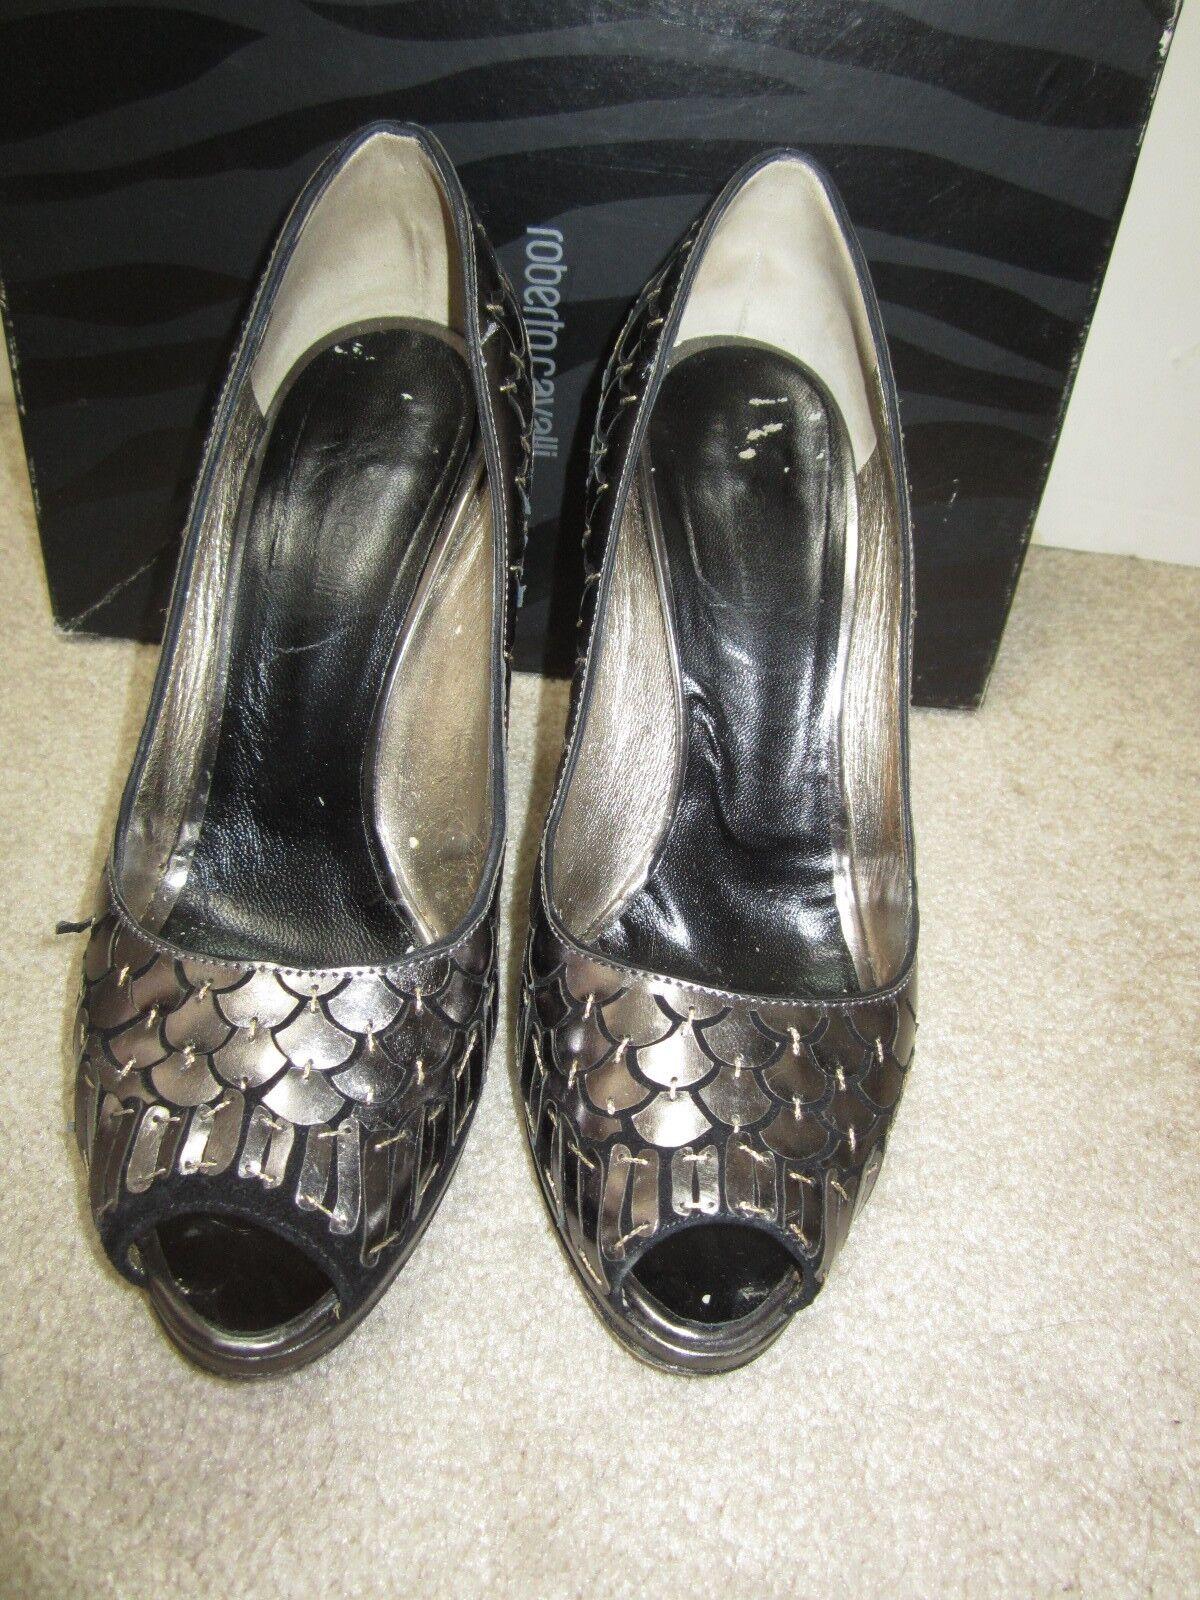 ROBERTO CAVALLI embellished platform Heels Pumps Schuhes sz 7